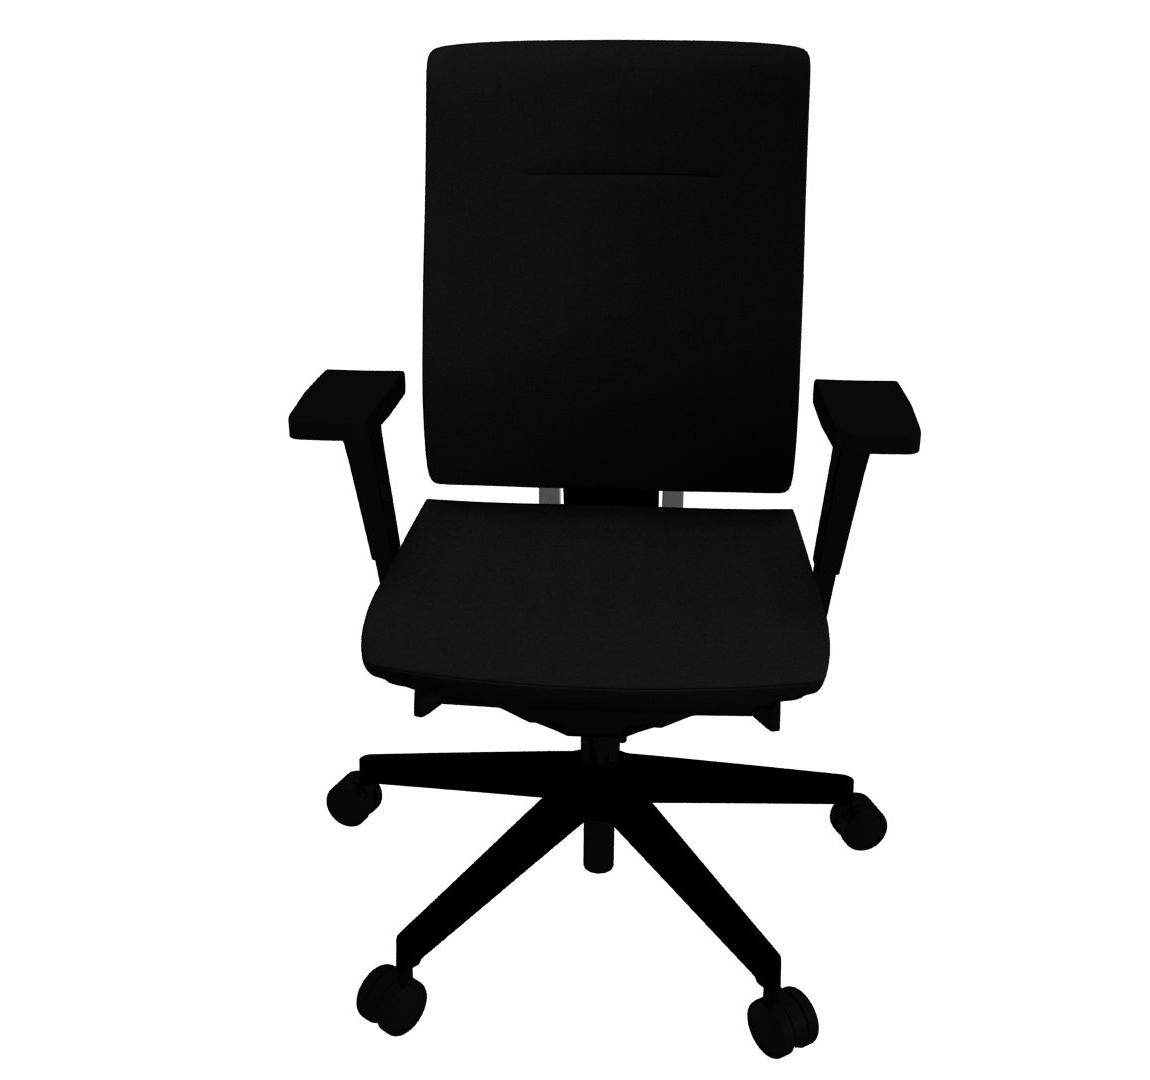 Profim Xenon 10sfl Bc10sf Buschmann Büromaterial Büroeinrichtung Bürotechnik 170 Jahre Erfahrung Im Büro